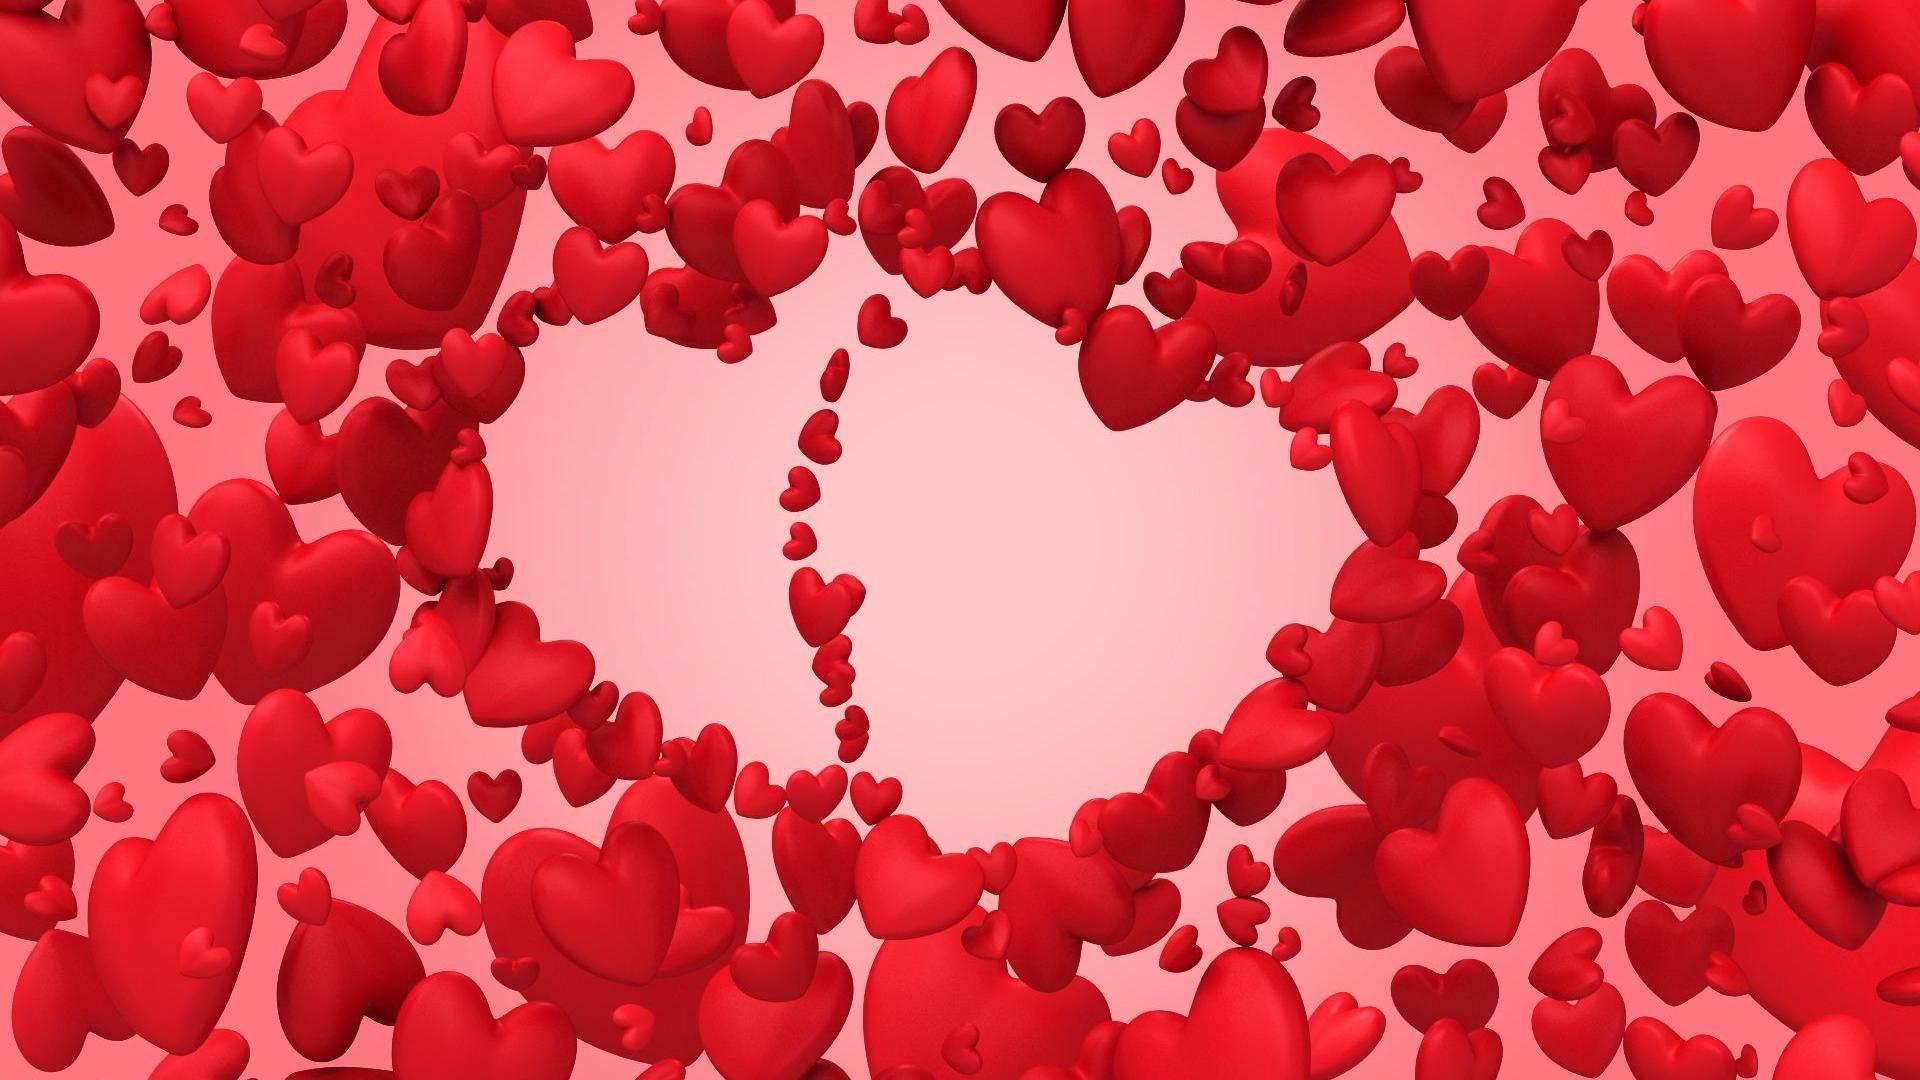 Wallpaper download hd love 2016 - Download Cool Little Hearts Love Hd Wallpaper